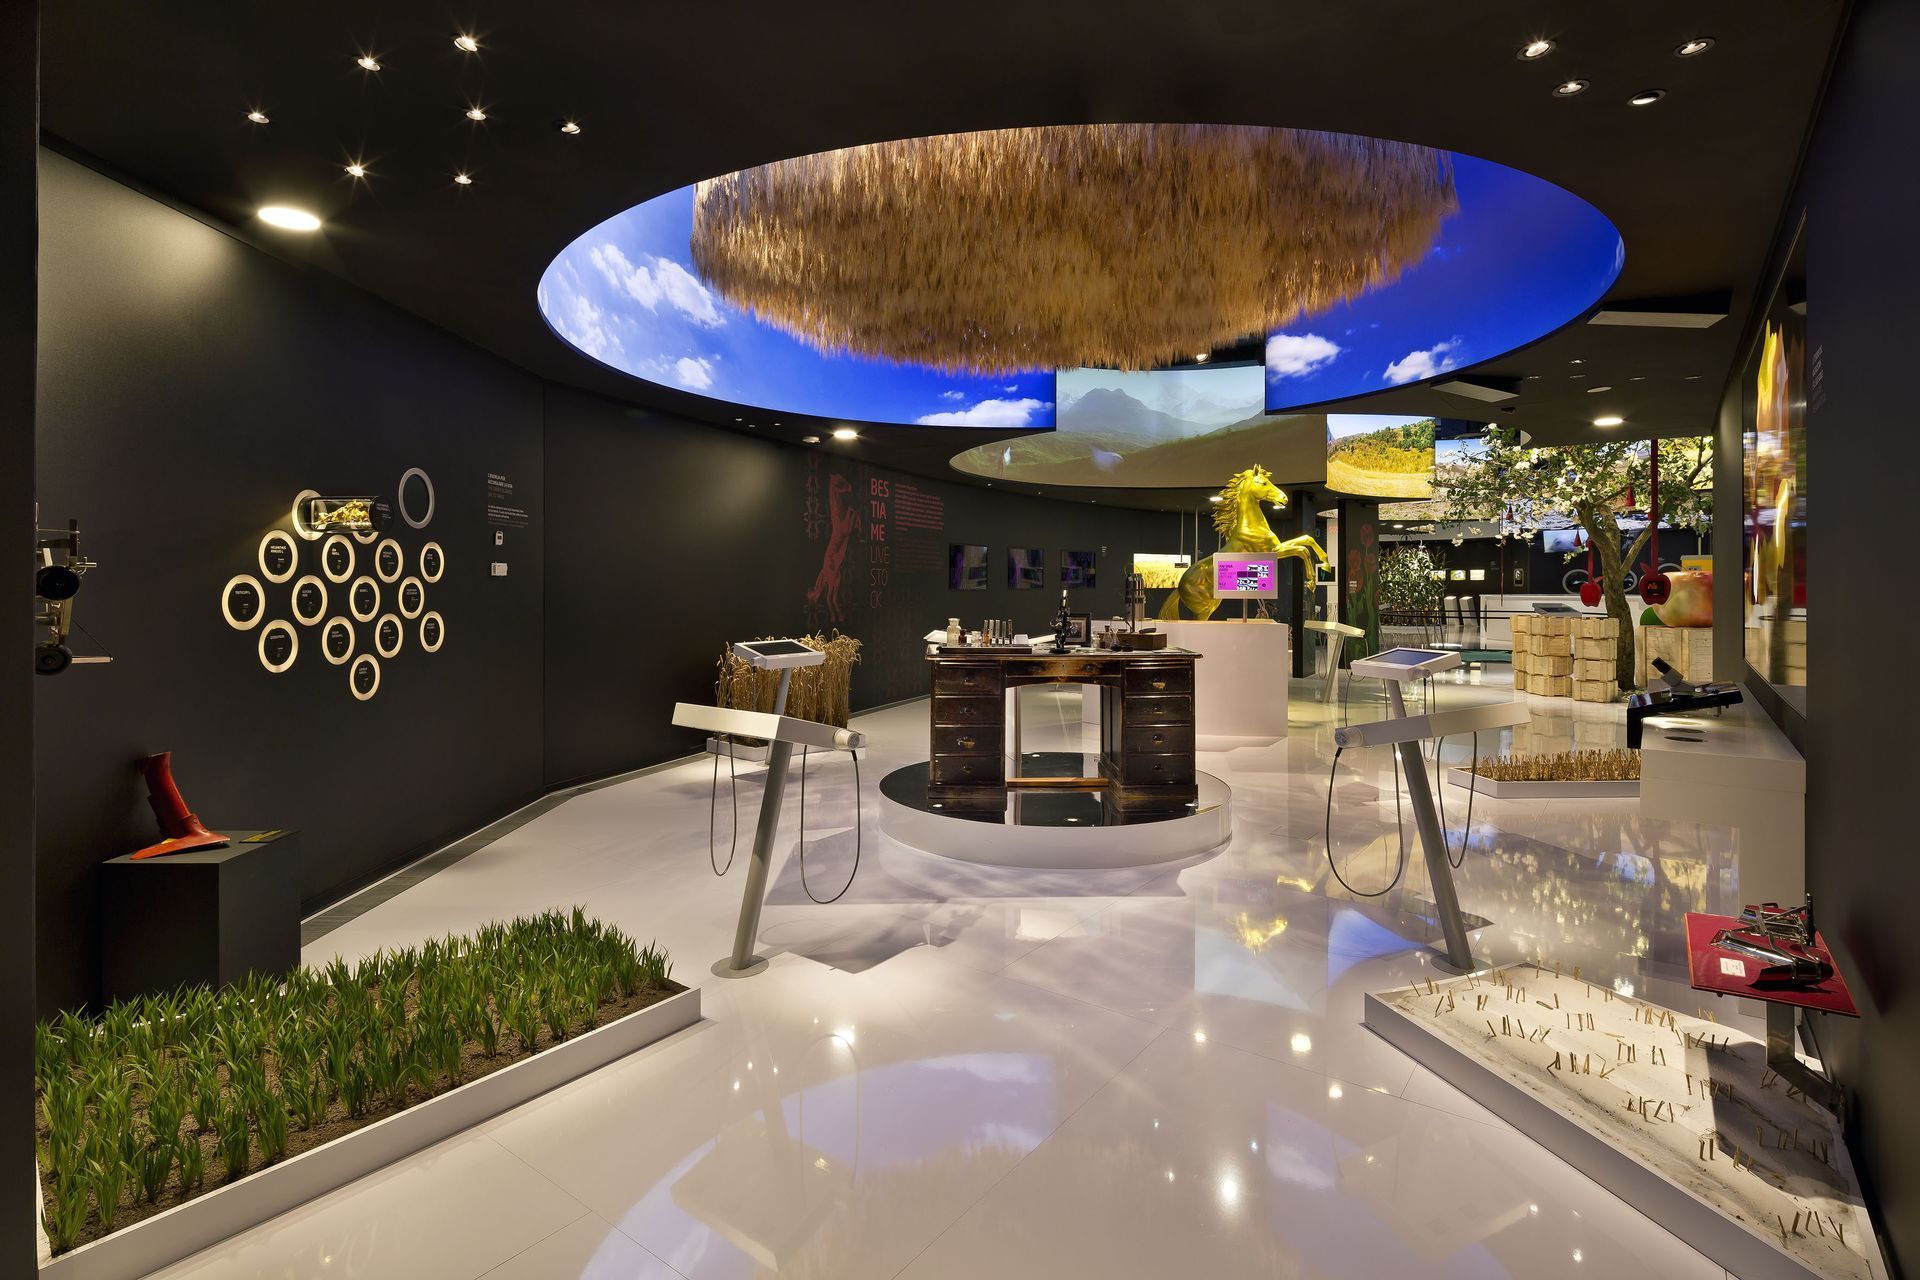 Referenzen Exhibition Display Design Exhibition Design Corporate Exhibitions